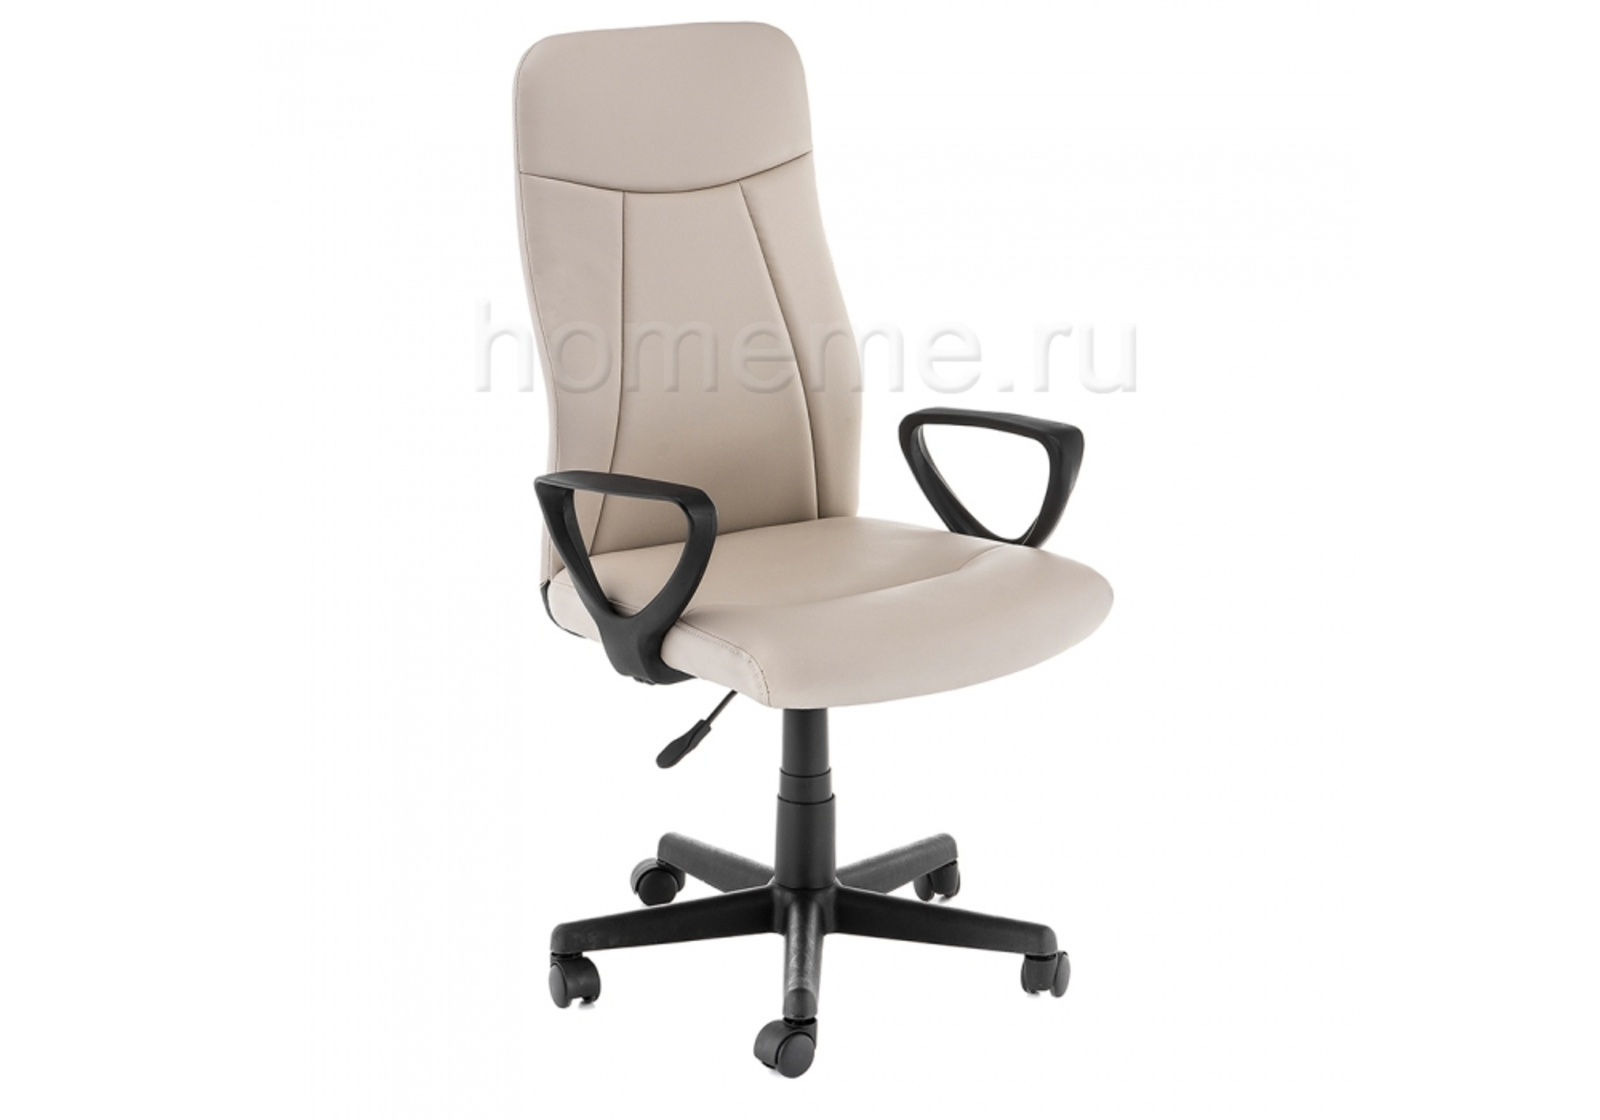 Кресло для офиса HomeMe Favor 11272 от Homeme.ru